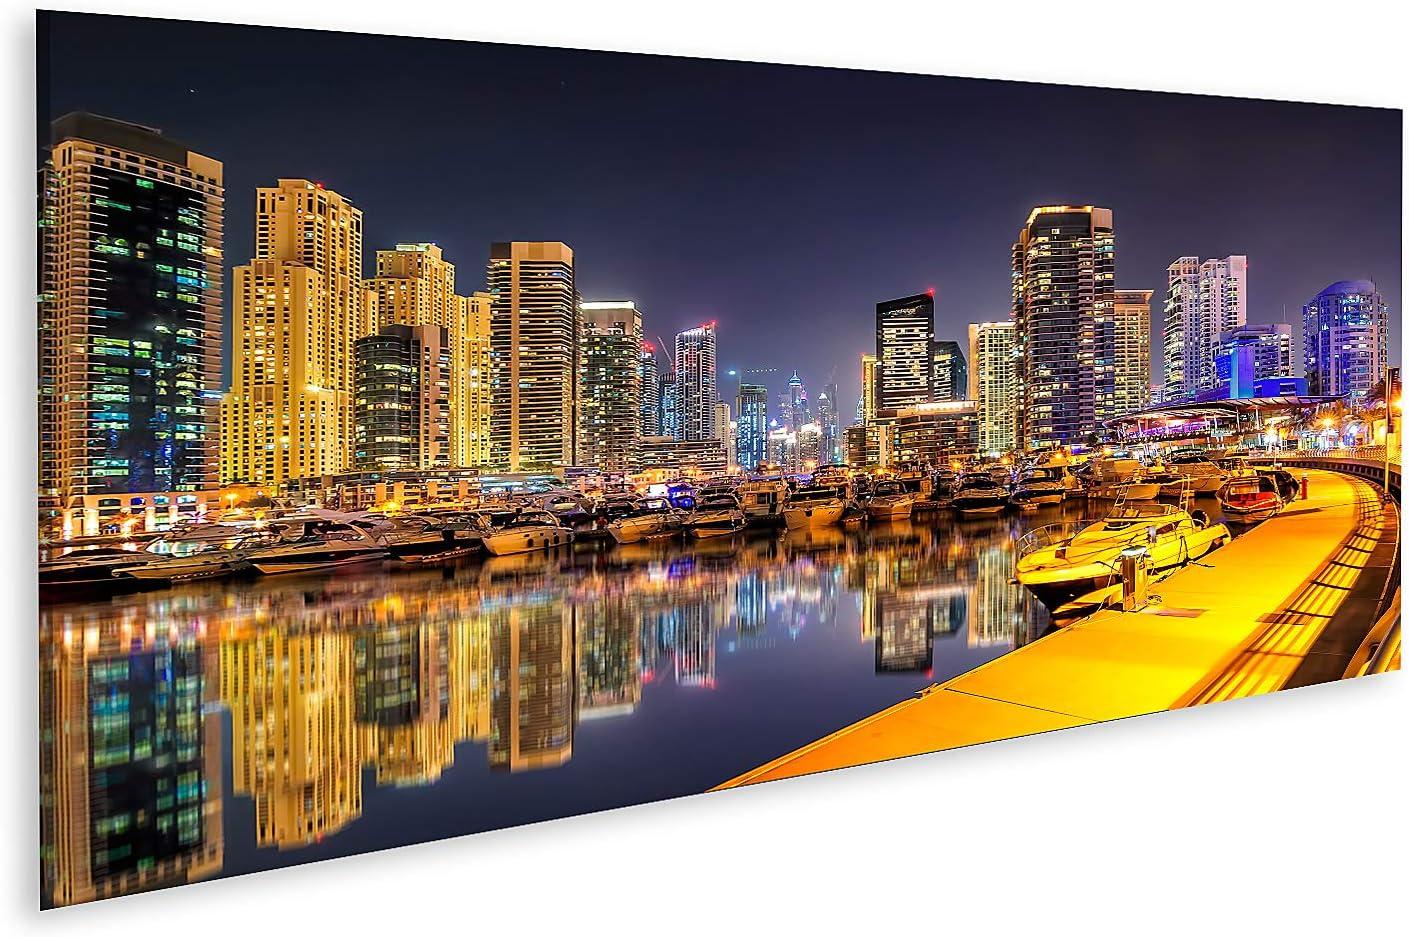 Bild auf Leinwand Unglaubliche Nacht Dubai Marina Skyline Luxusyachtdock Dubai Vereinigte Arabische Emirate Bilder Wandbild Poster Leinwandbild